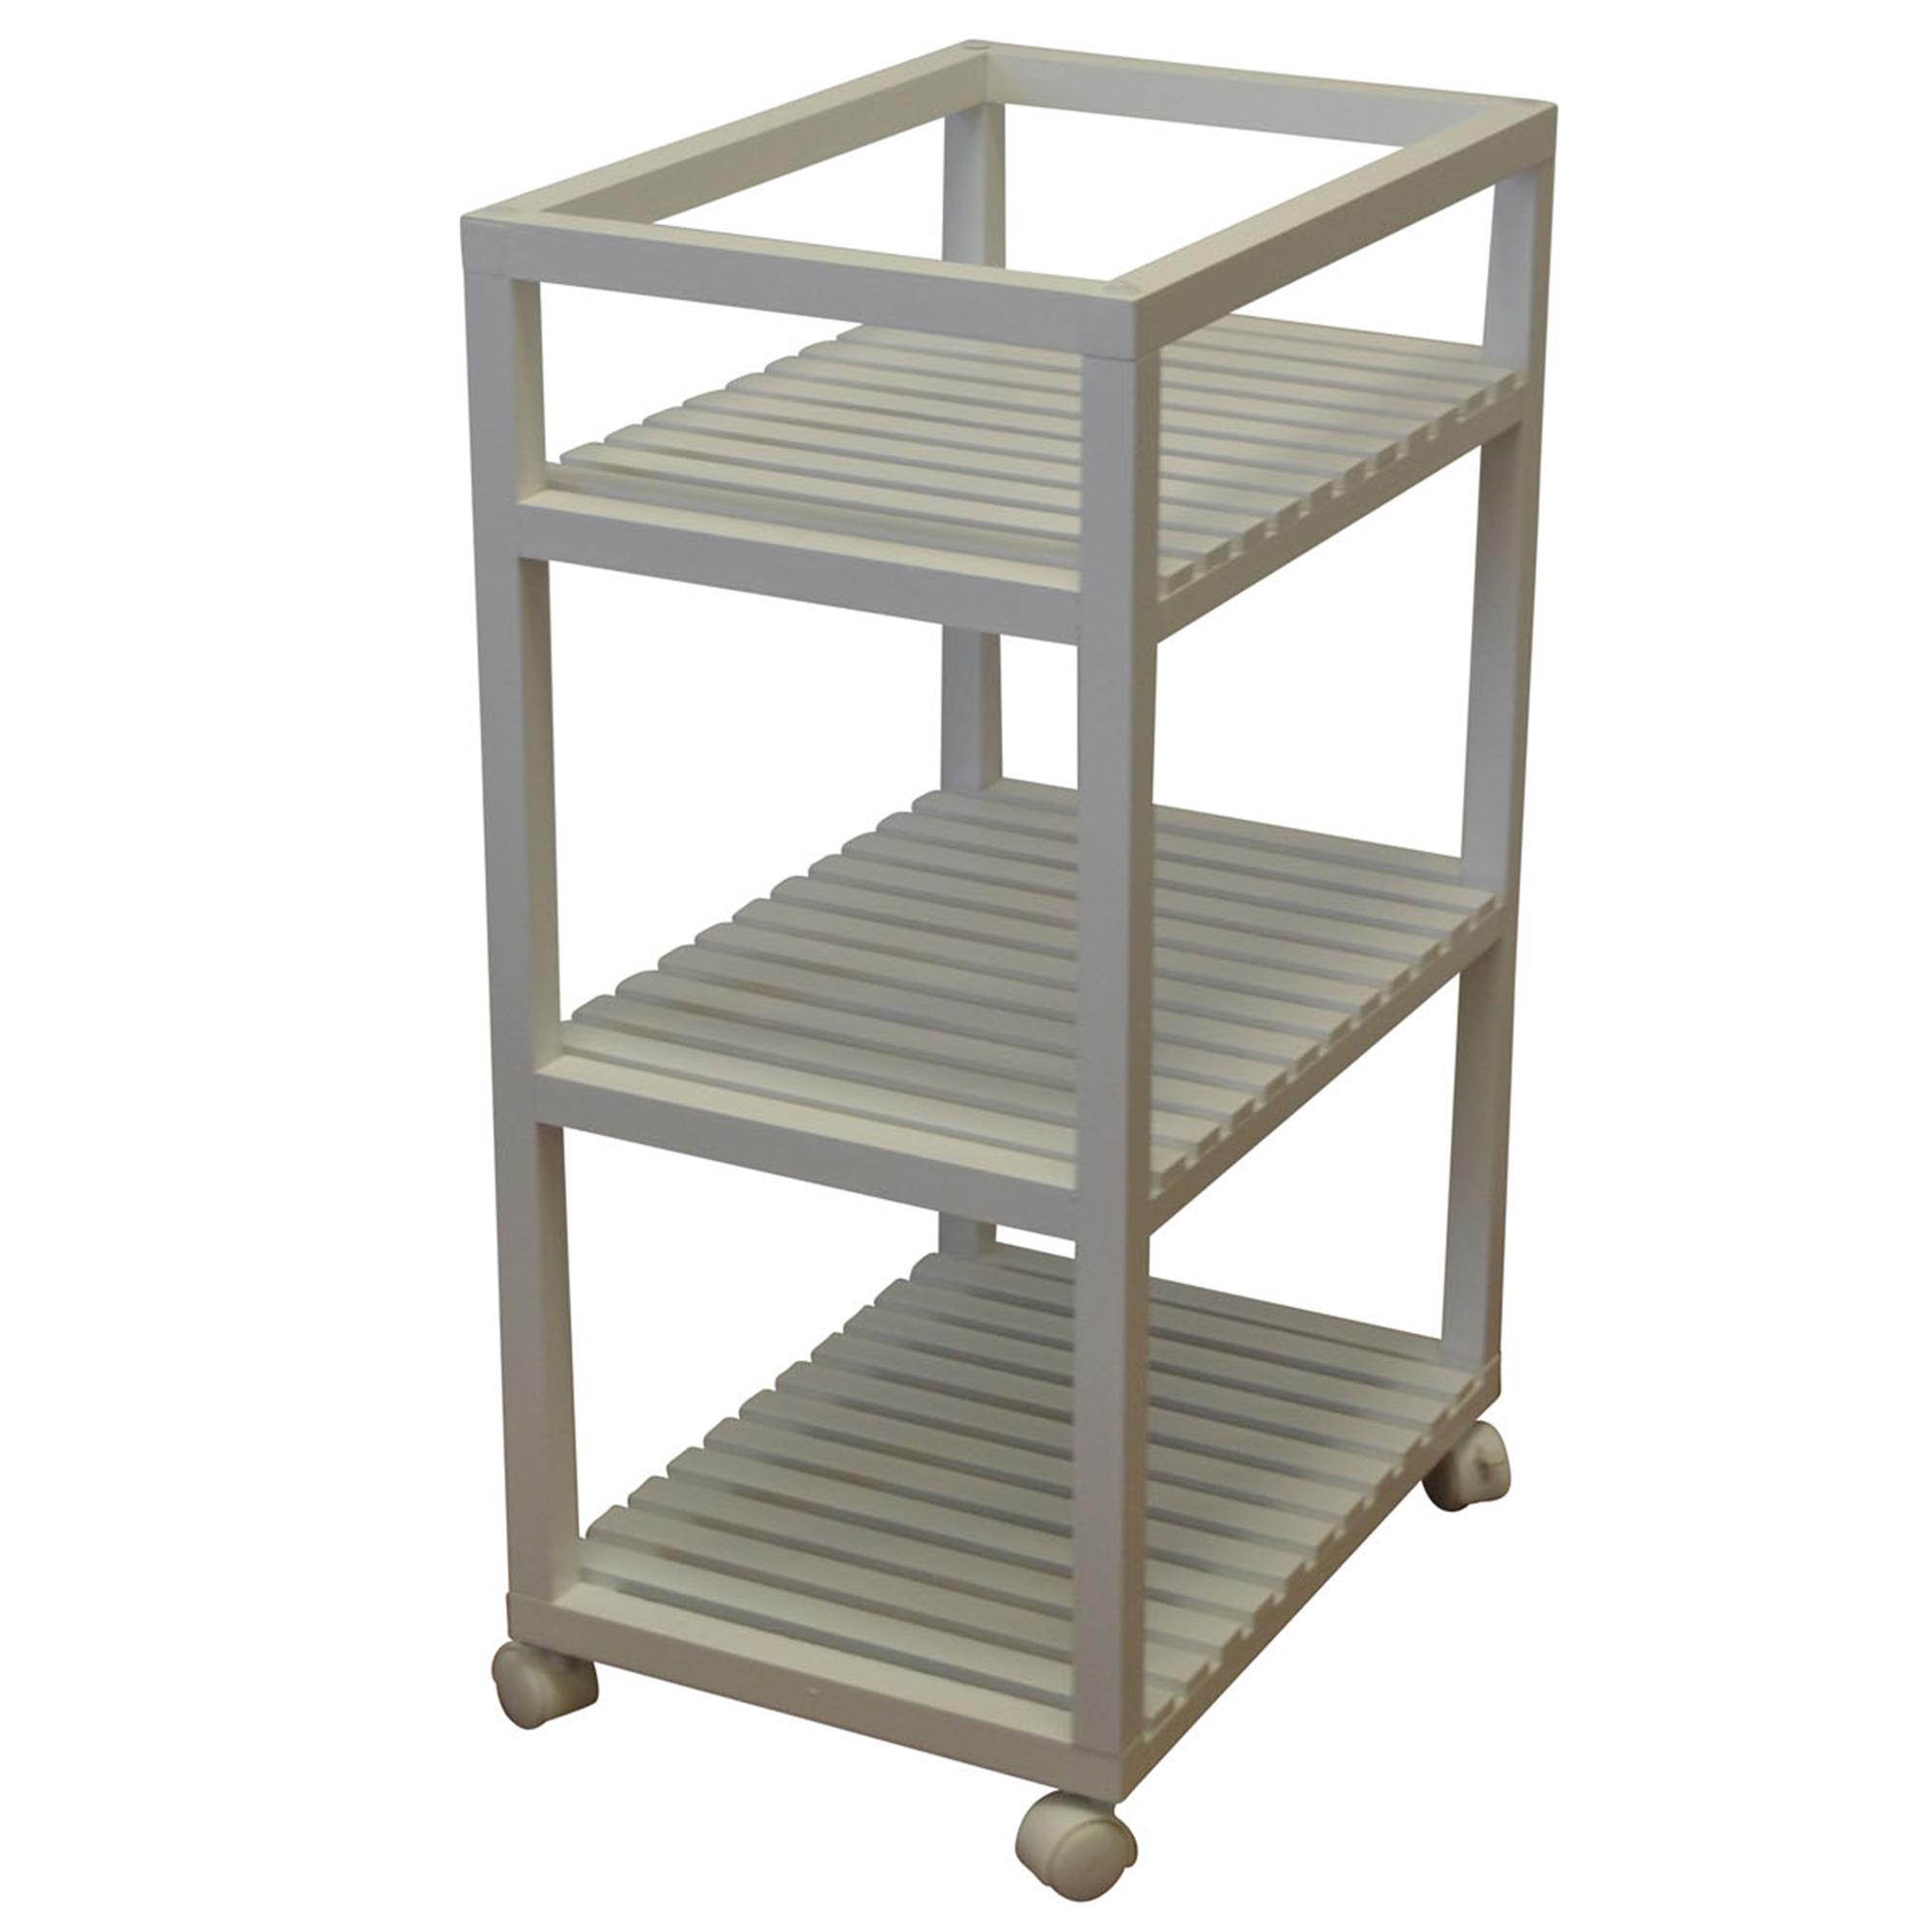 rack racks cart item laundry bedroom langria mesh shelving multifunctional from shelf bathroom washroom for rolling in tier metal holders kitchen storage